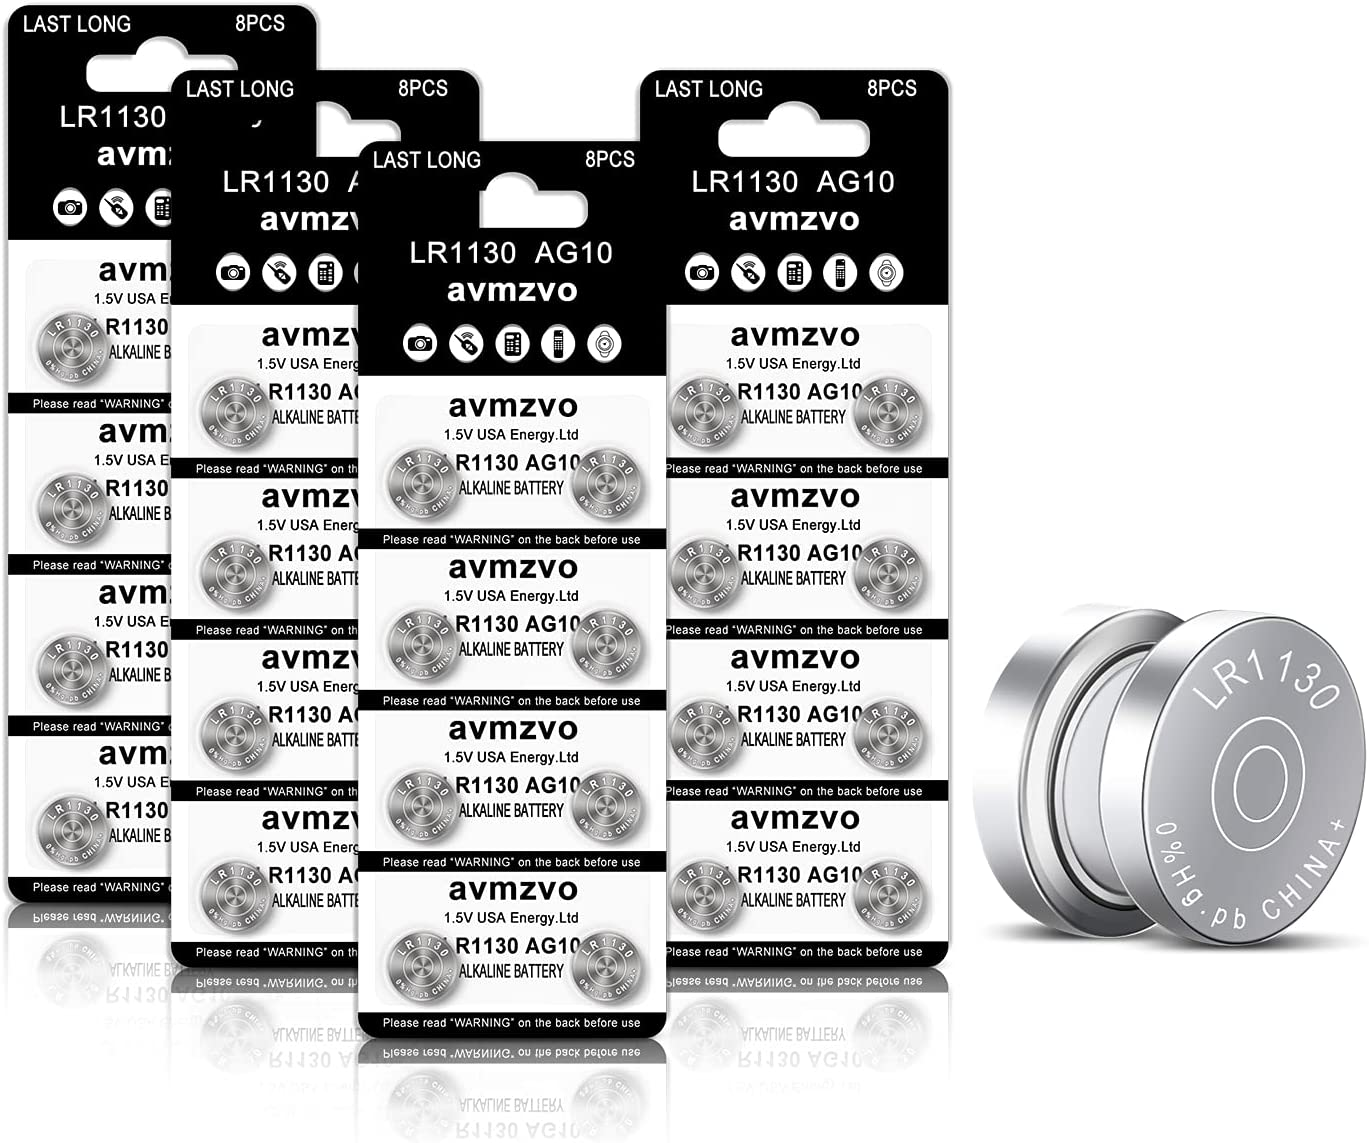 Avmzvo LR1130 Battery AG10 Battery 1.5V Long-Lasting Alkaline Button Cell Batteries (32 Count)【3-Year Warranty】